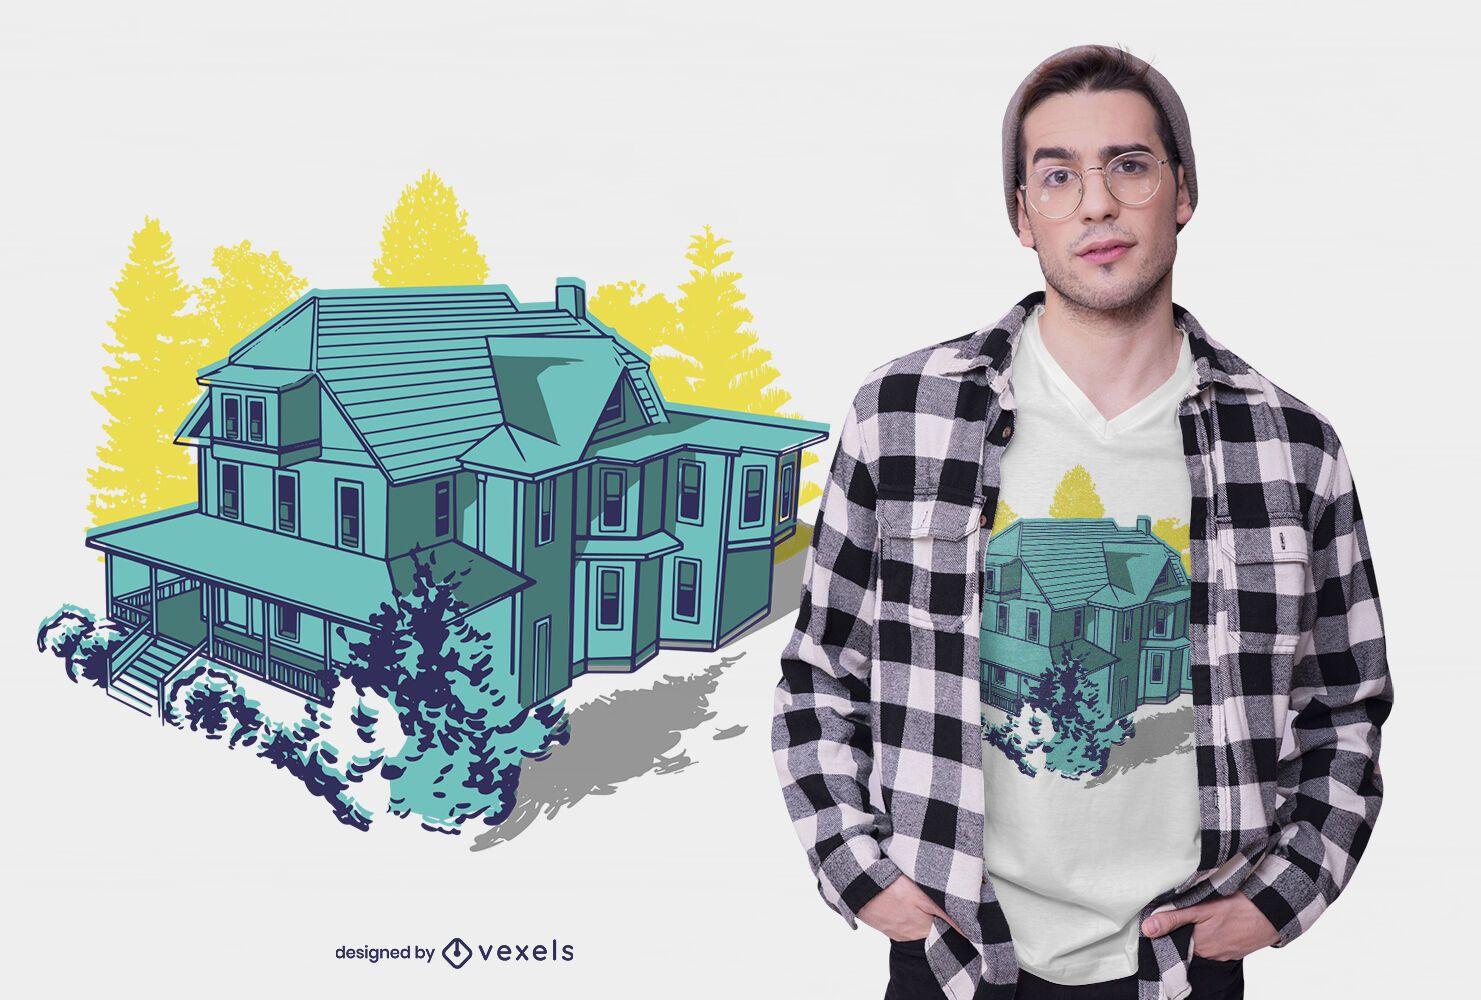 House duotone t-shirt design